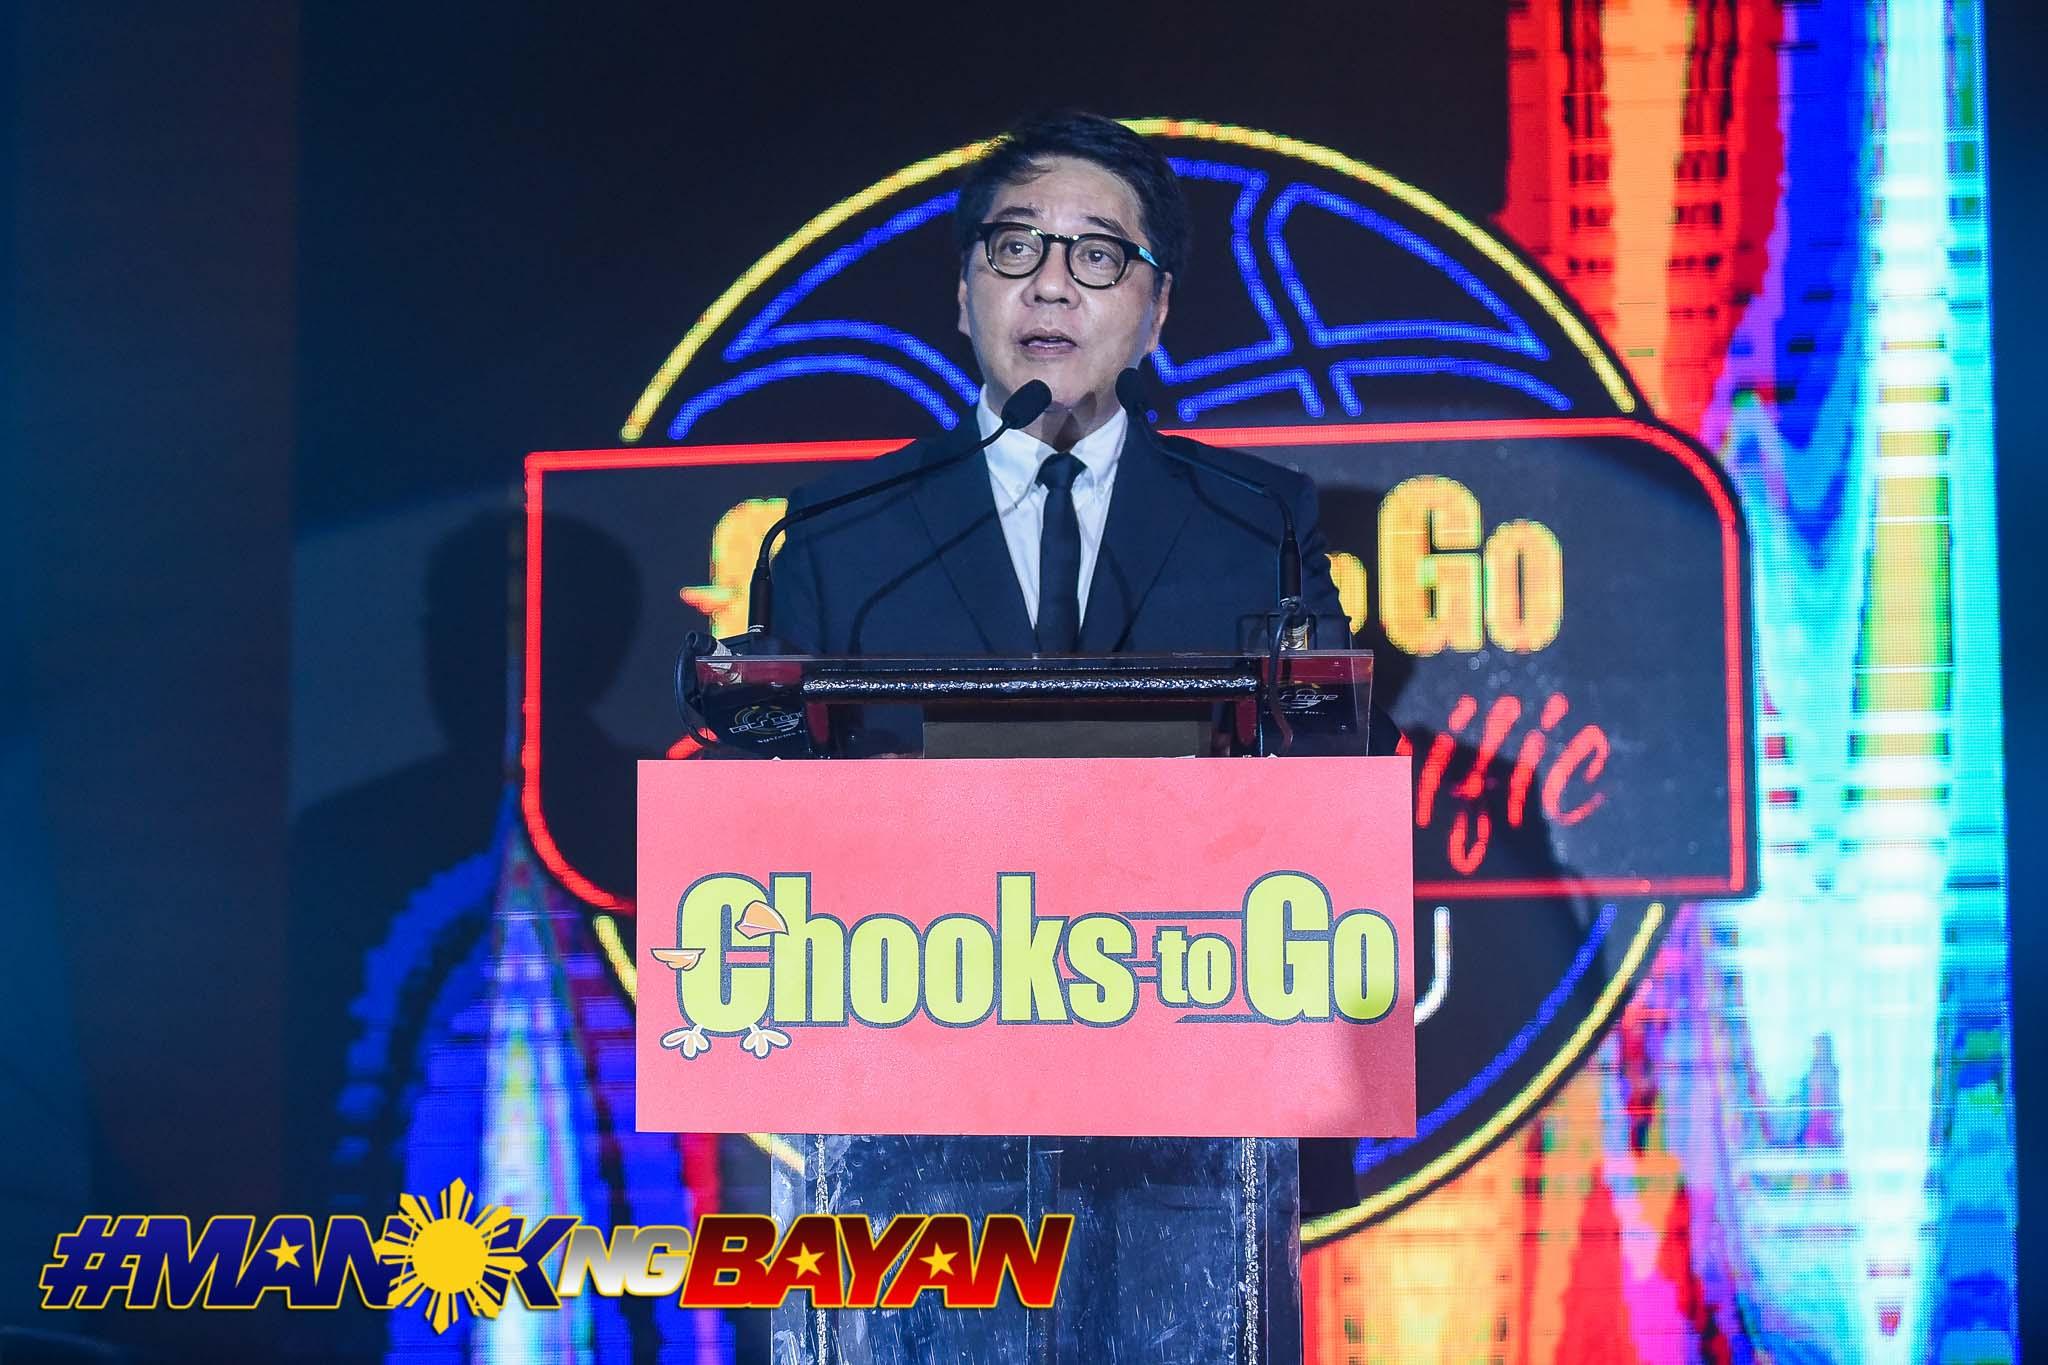 Tiebreaker Times Chooks-to-Go brings FIBA 3x3 World Tour Masters back to Manila 3x3 Basketball Chooks-to-Go Pilipinas 3x3 News  Ronald Mascarinas 2020 Chooks-to-Go Pilipinas 3x3 Season 2020 Chooks-to-Go Manila Masters